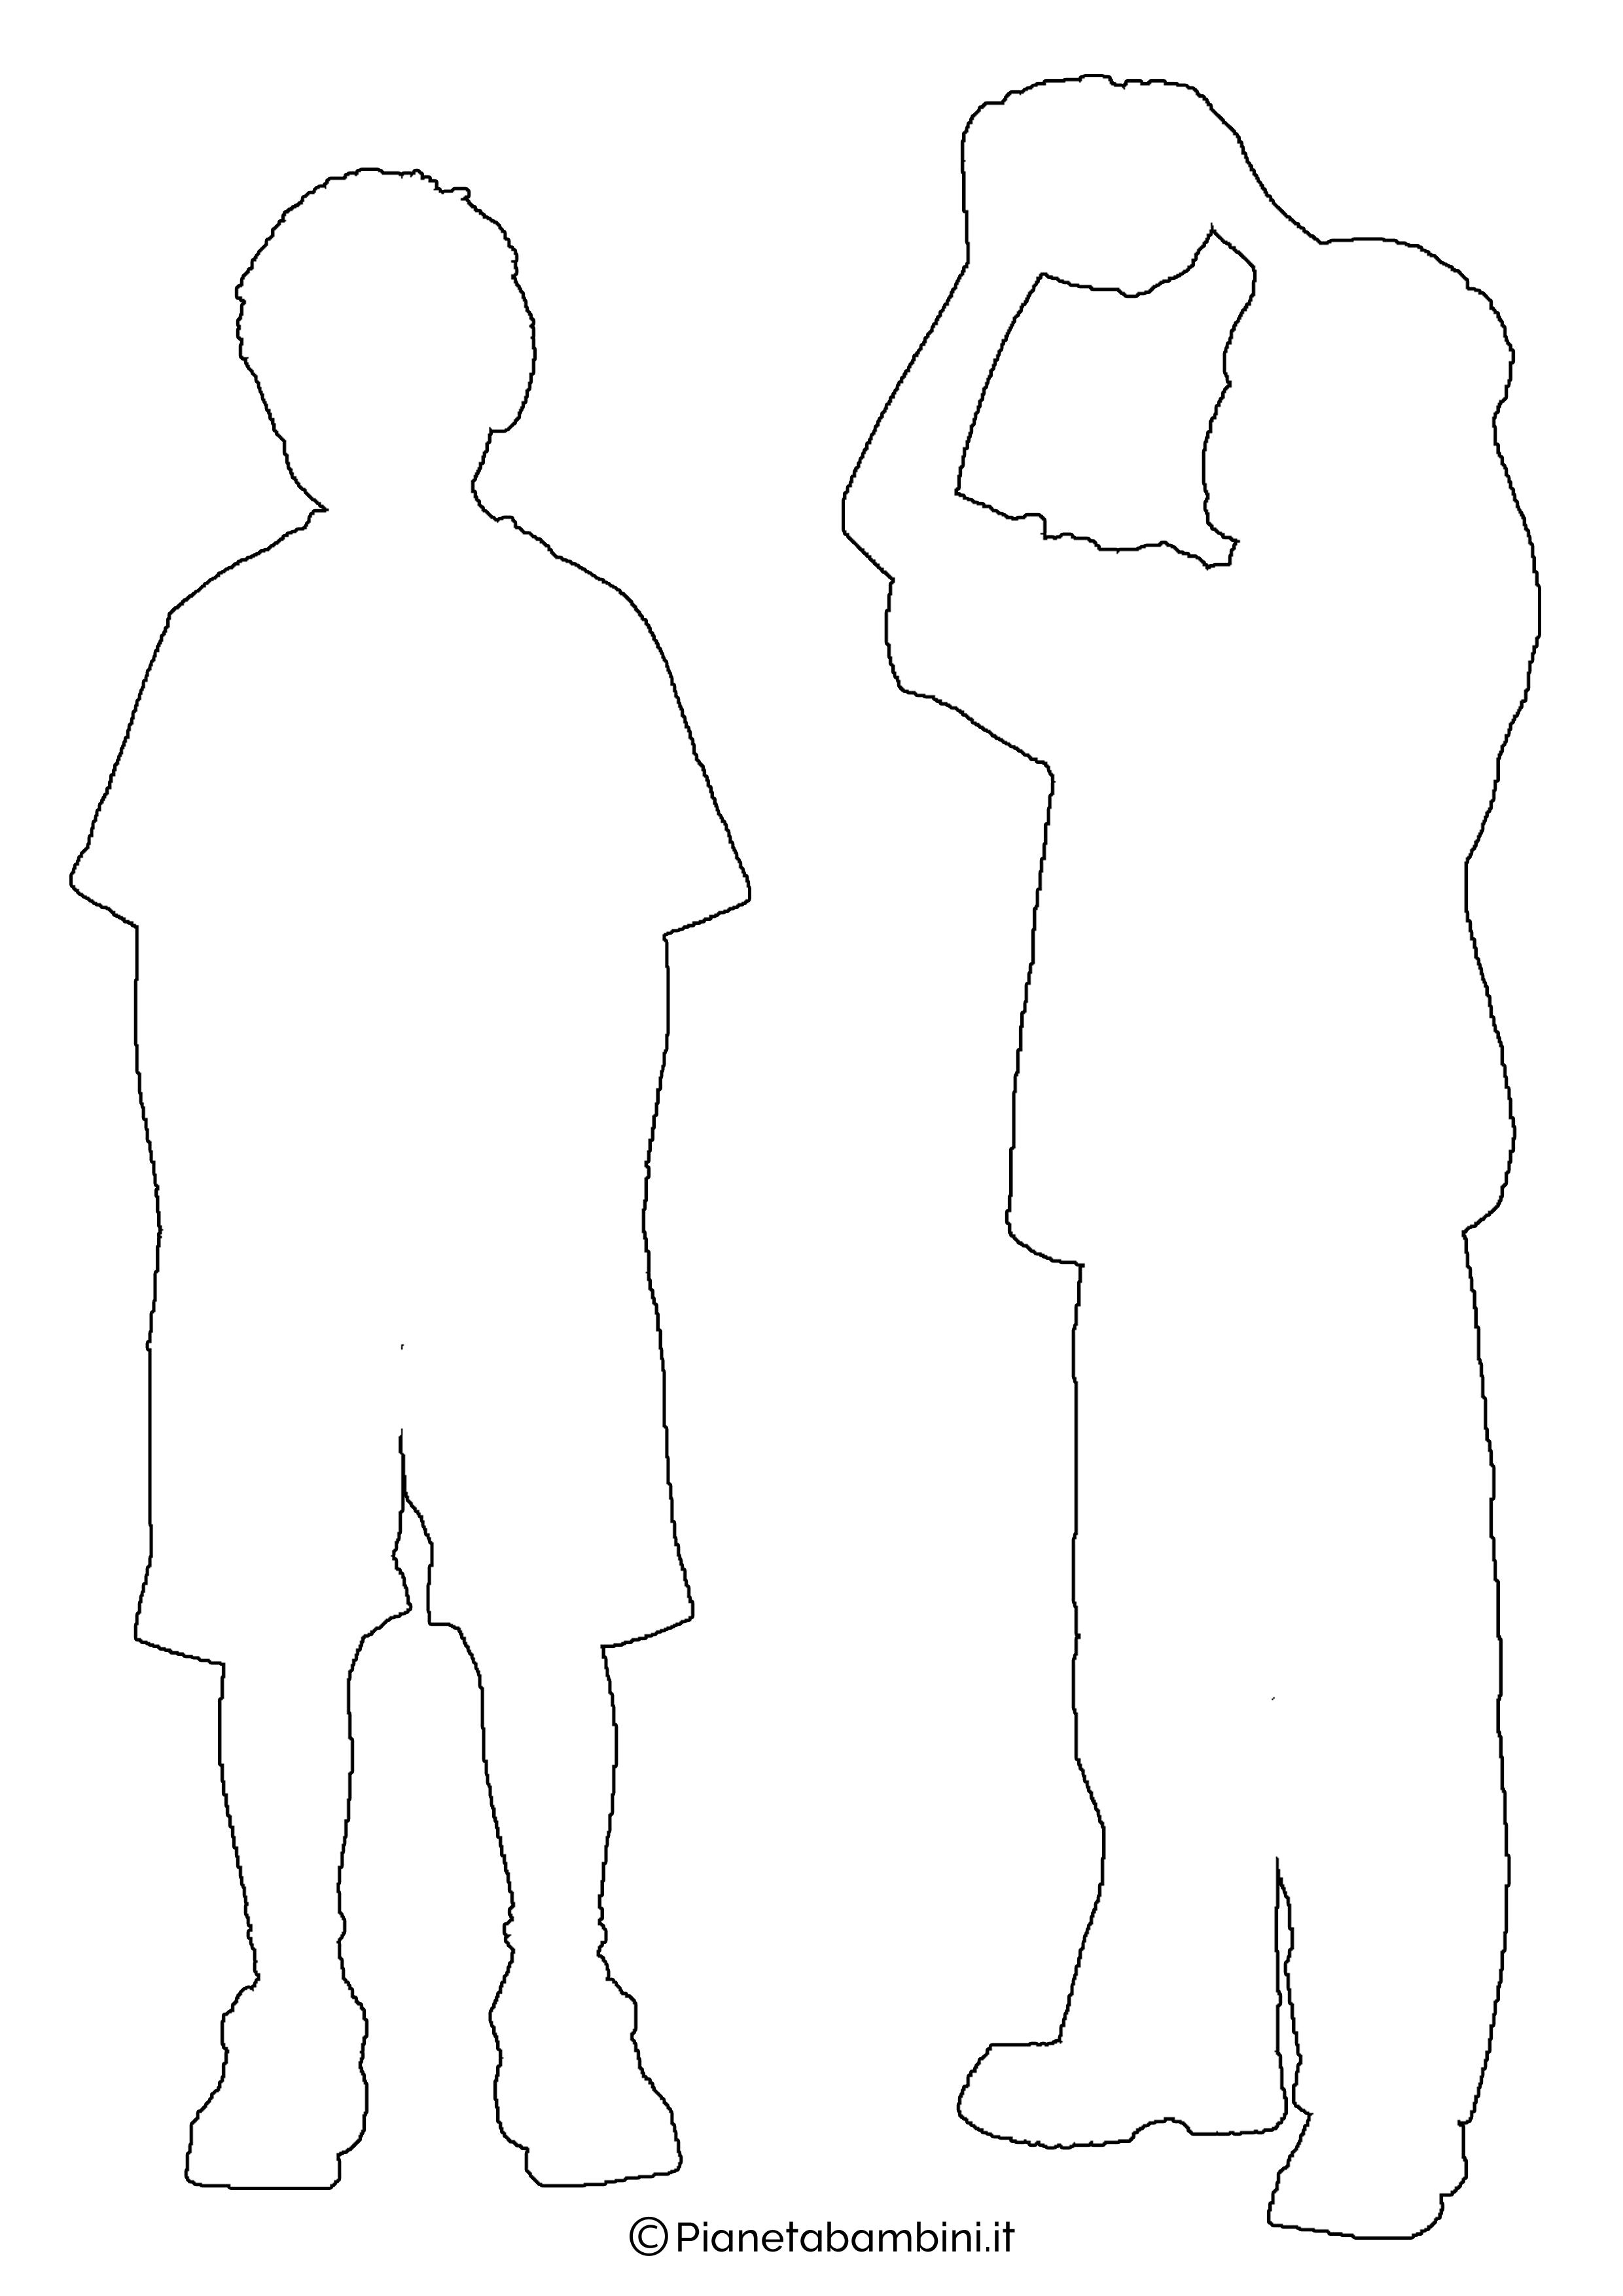 Sagome-Bambini-Grandi-10